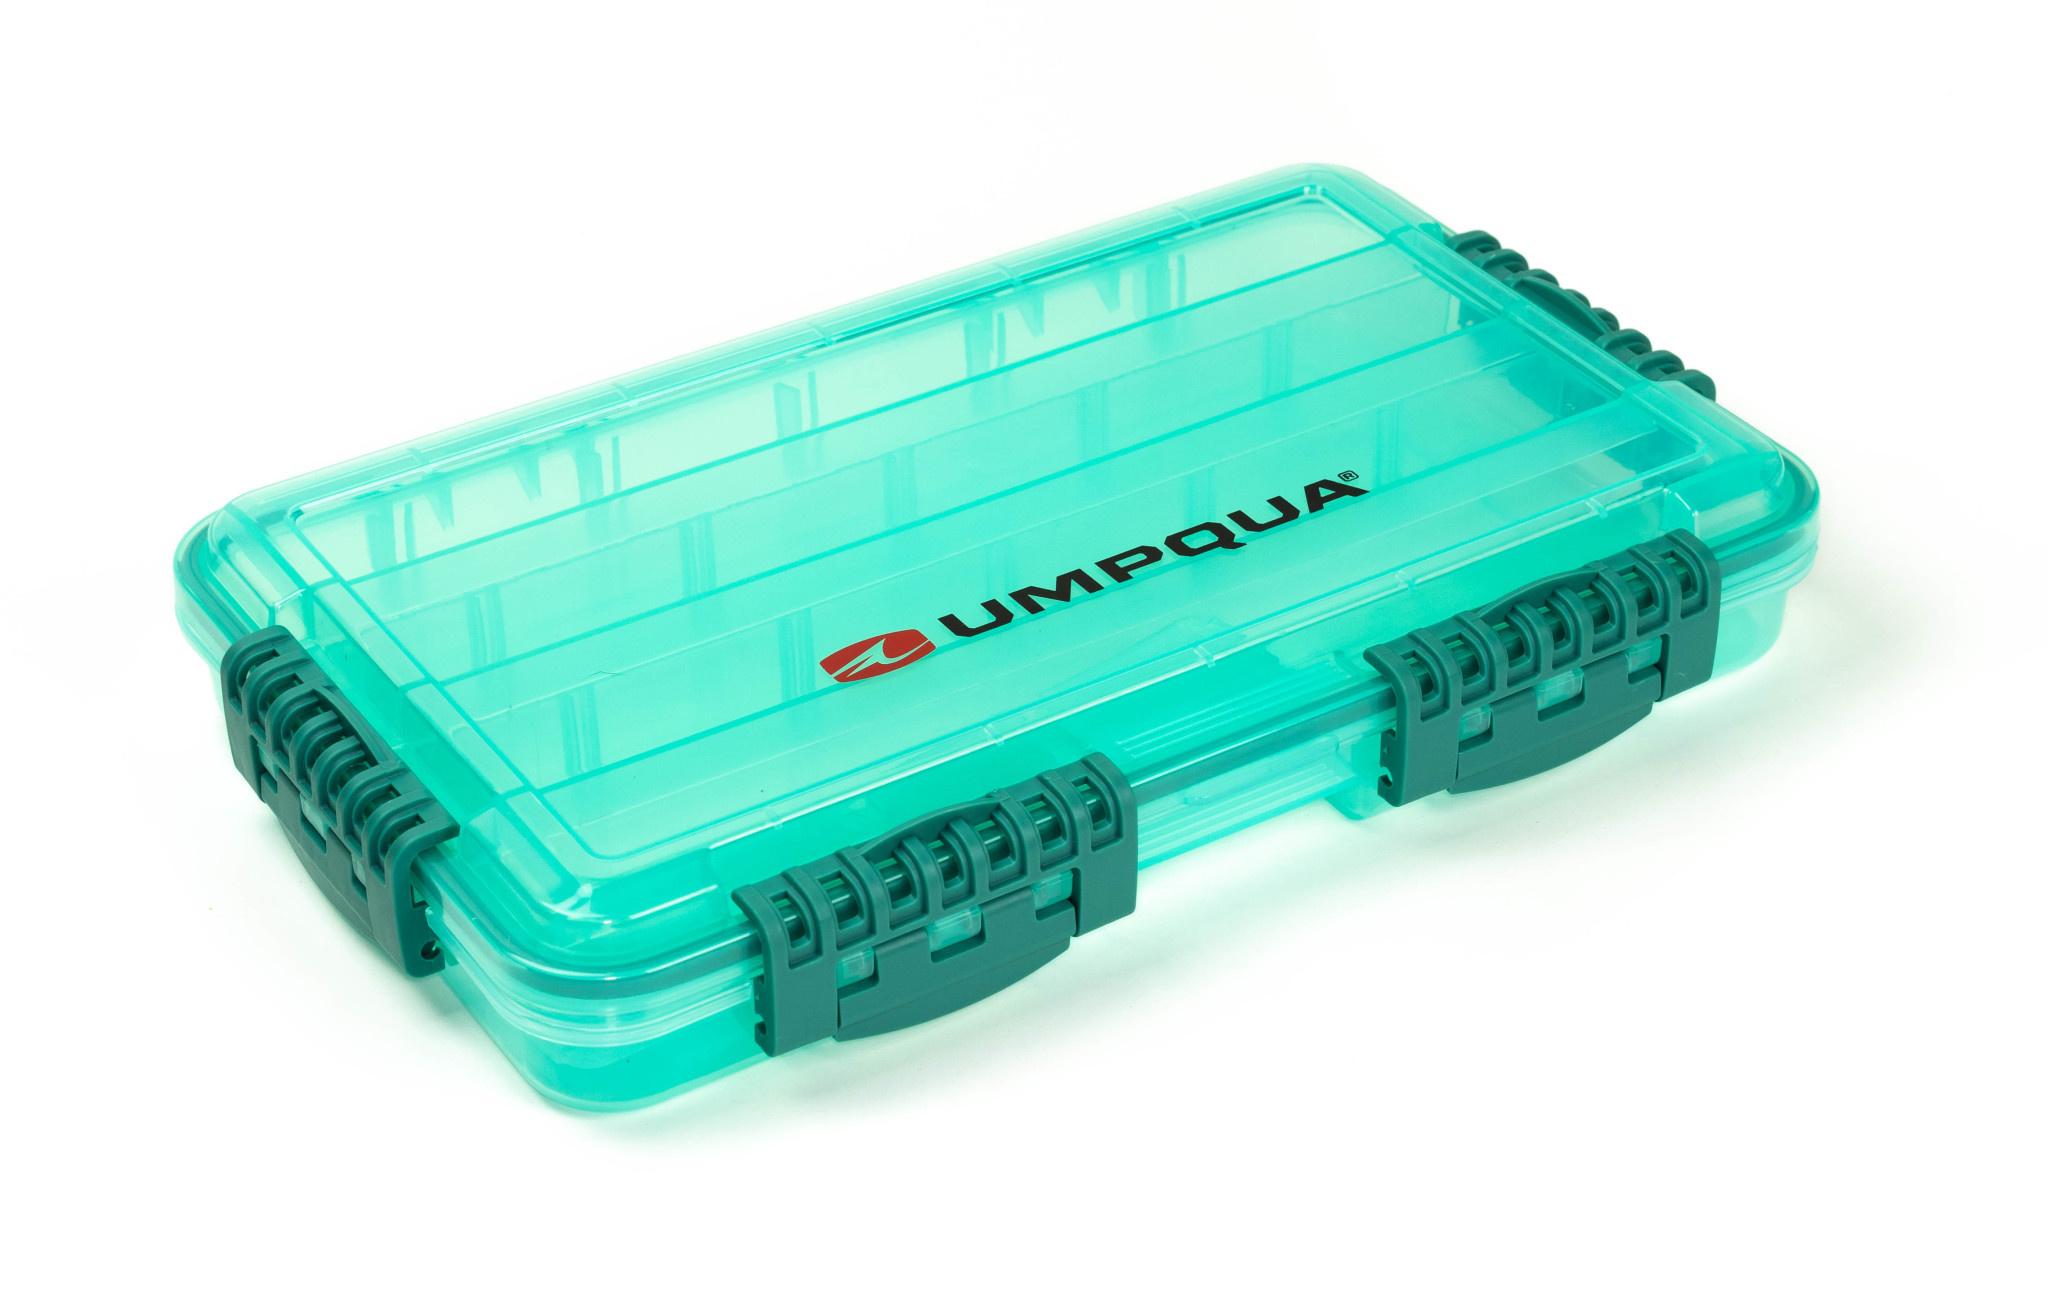 Umpqua Waterproof Bug Locker